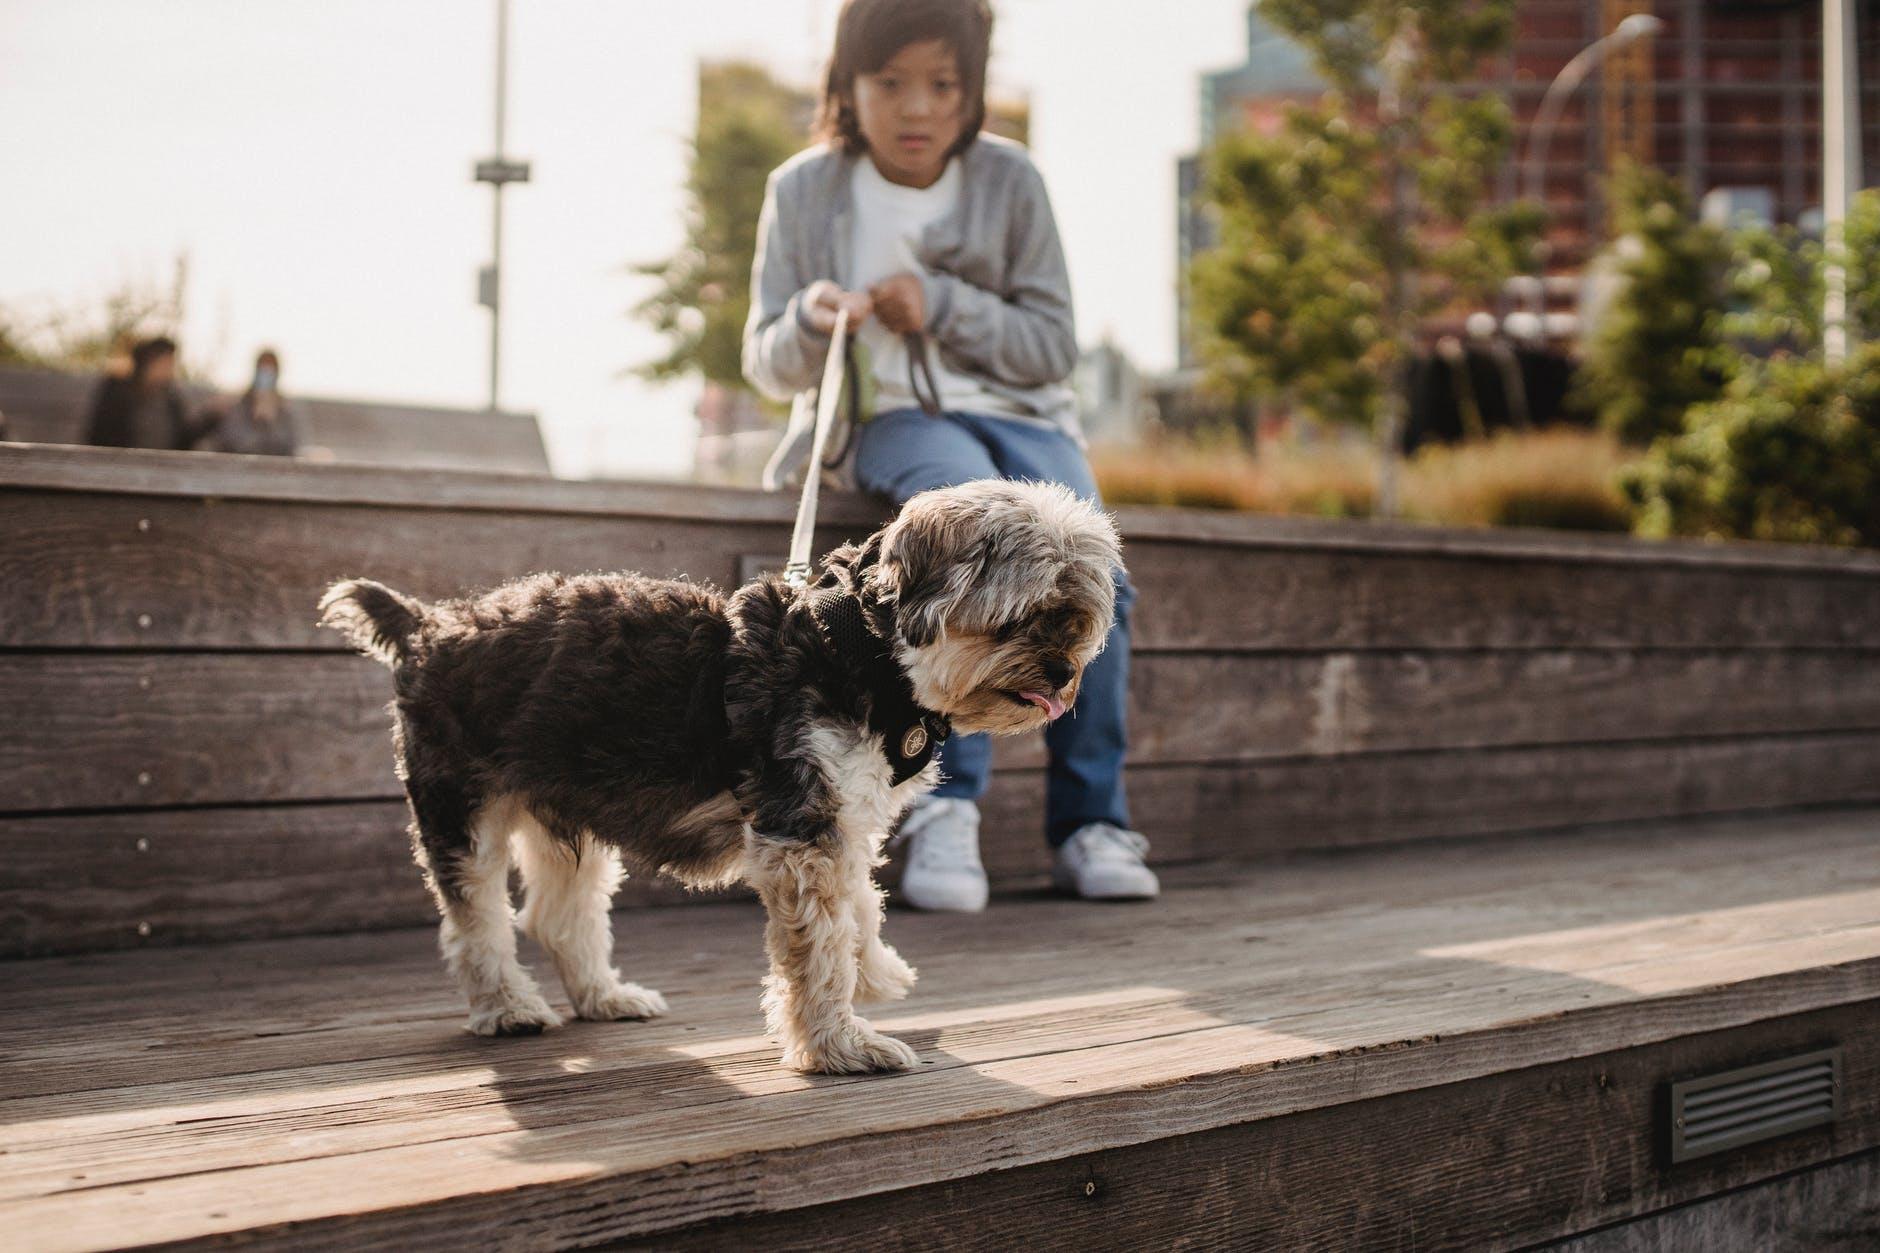 ethnic little boy with dog on leash